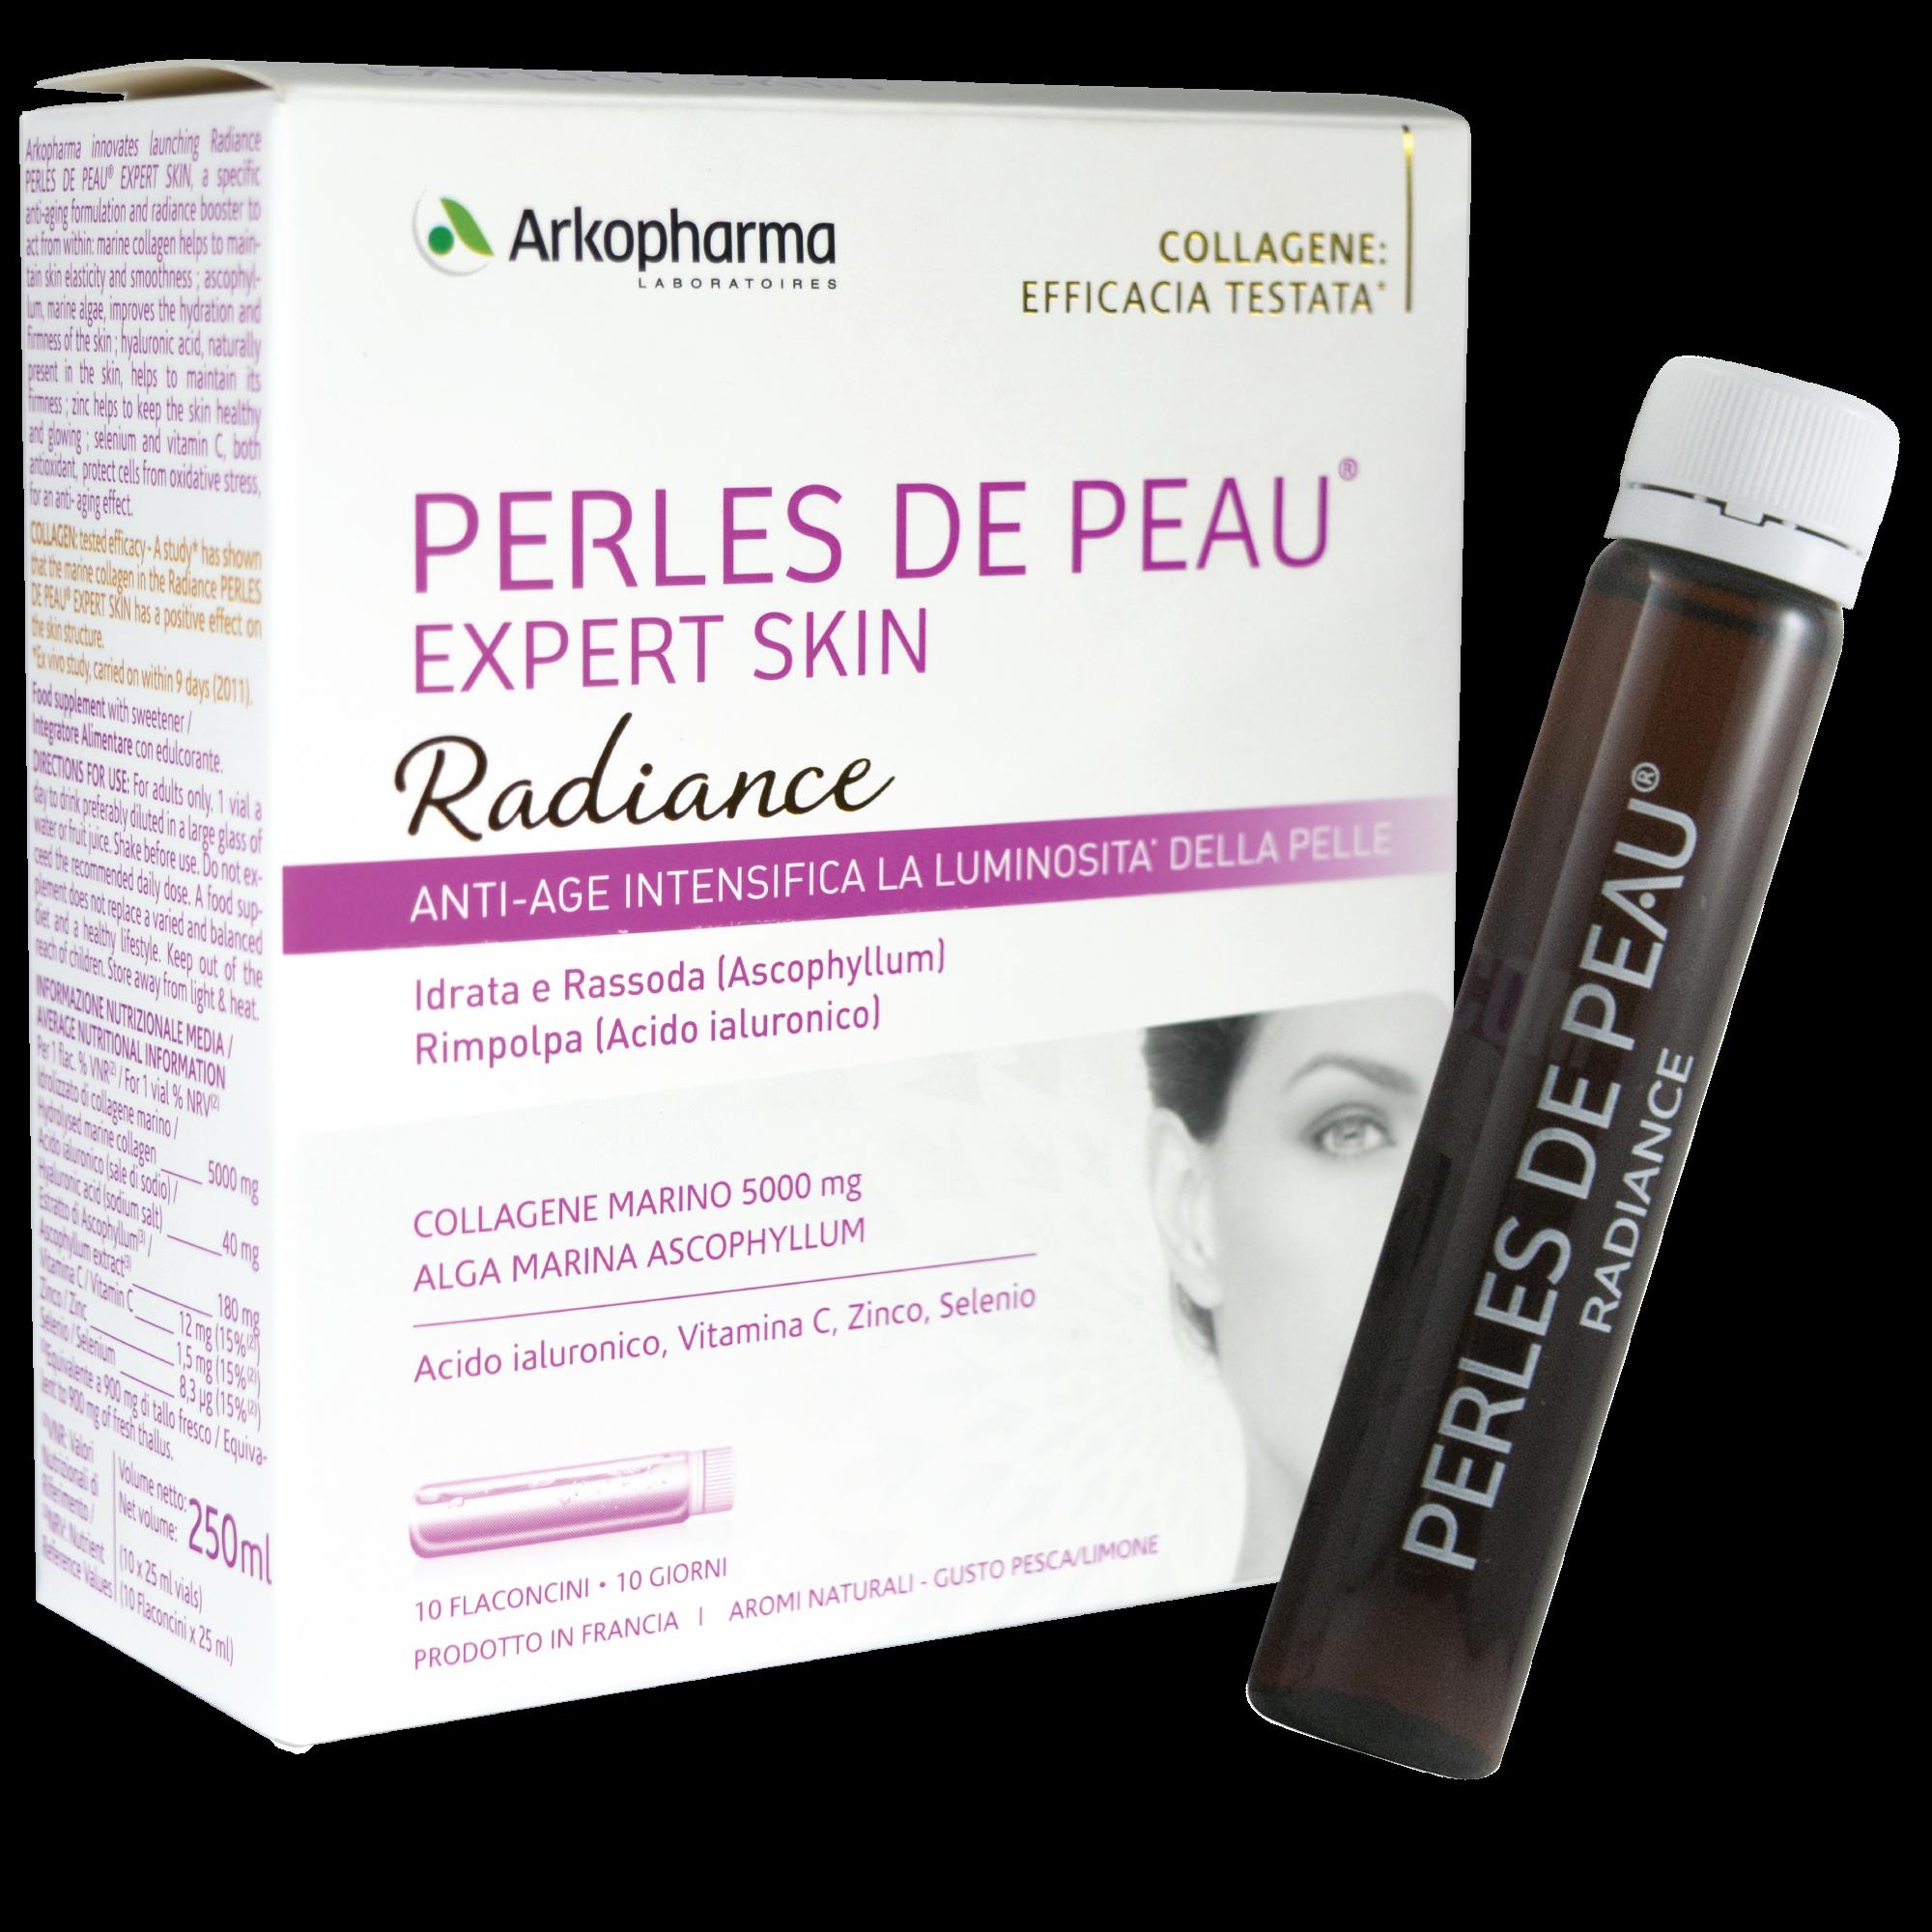 Nước uống Collagen Perles De Peau Expert Skin